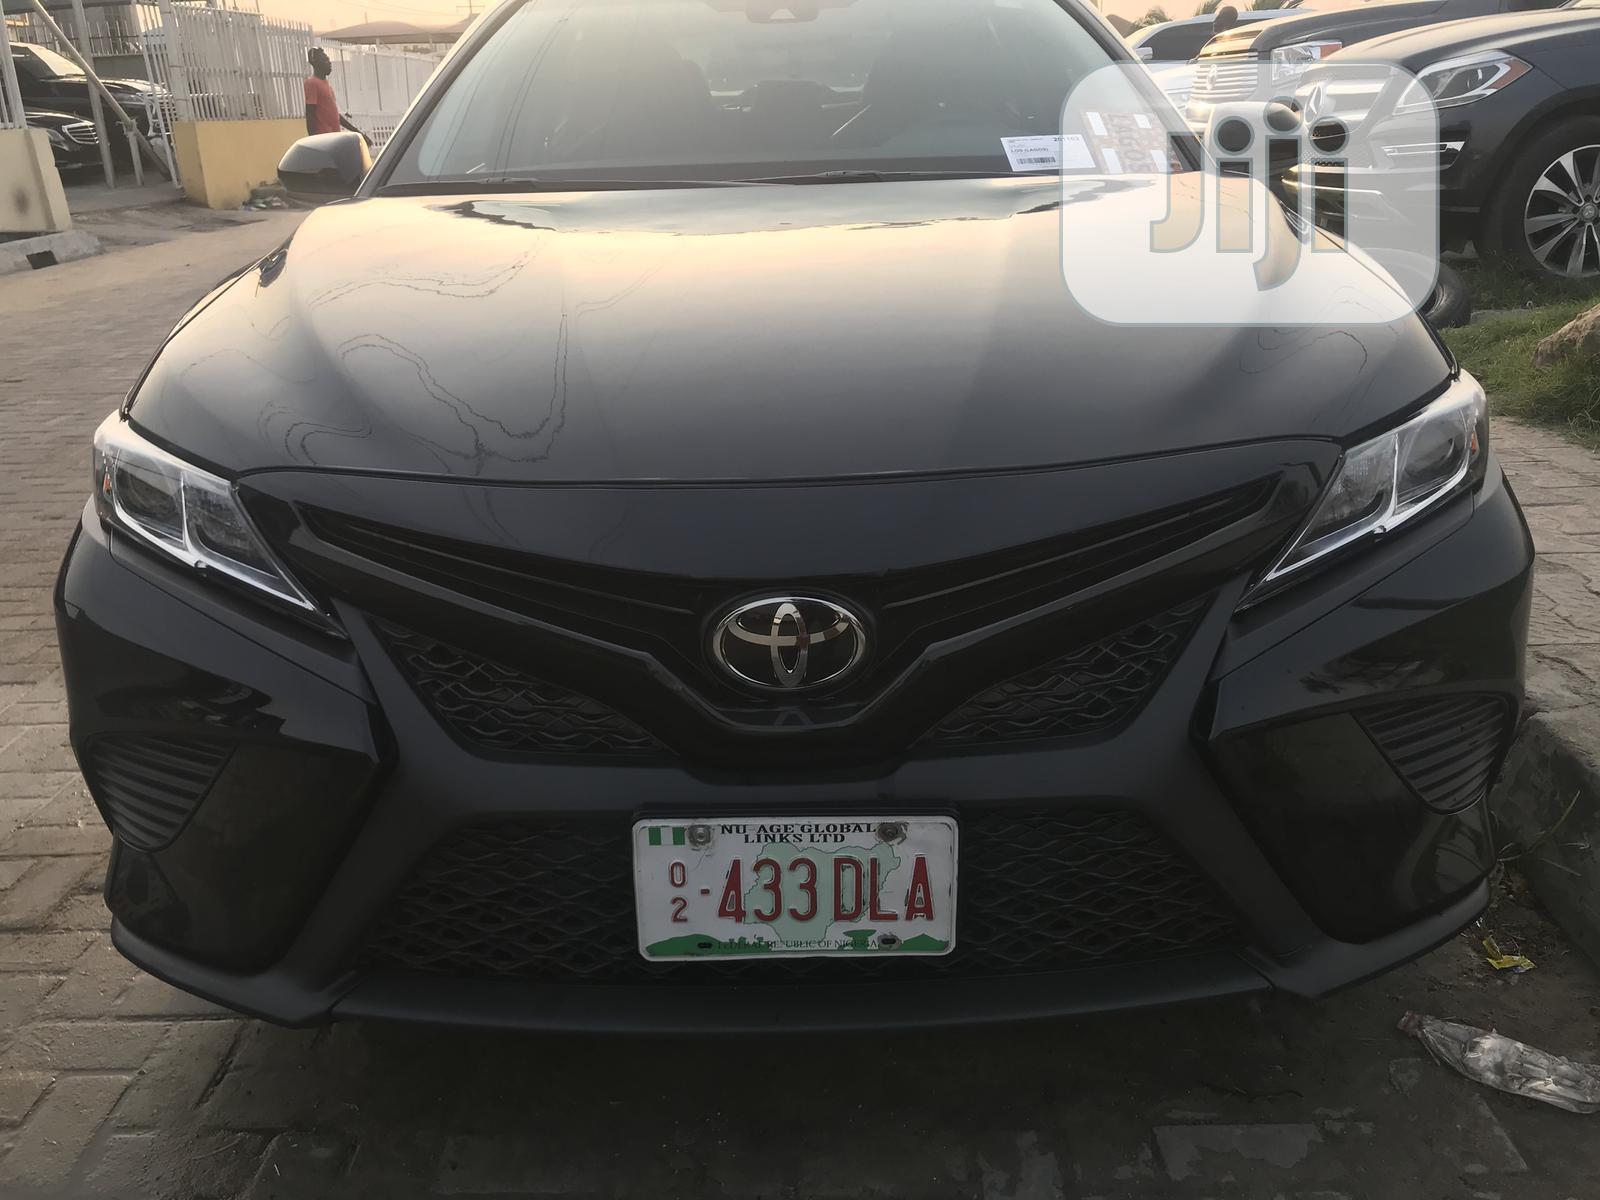 Toyota Camry 2018 SE FWD (2.5L 4cyl 8AM) Black